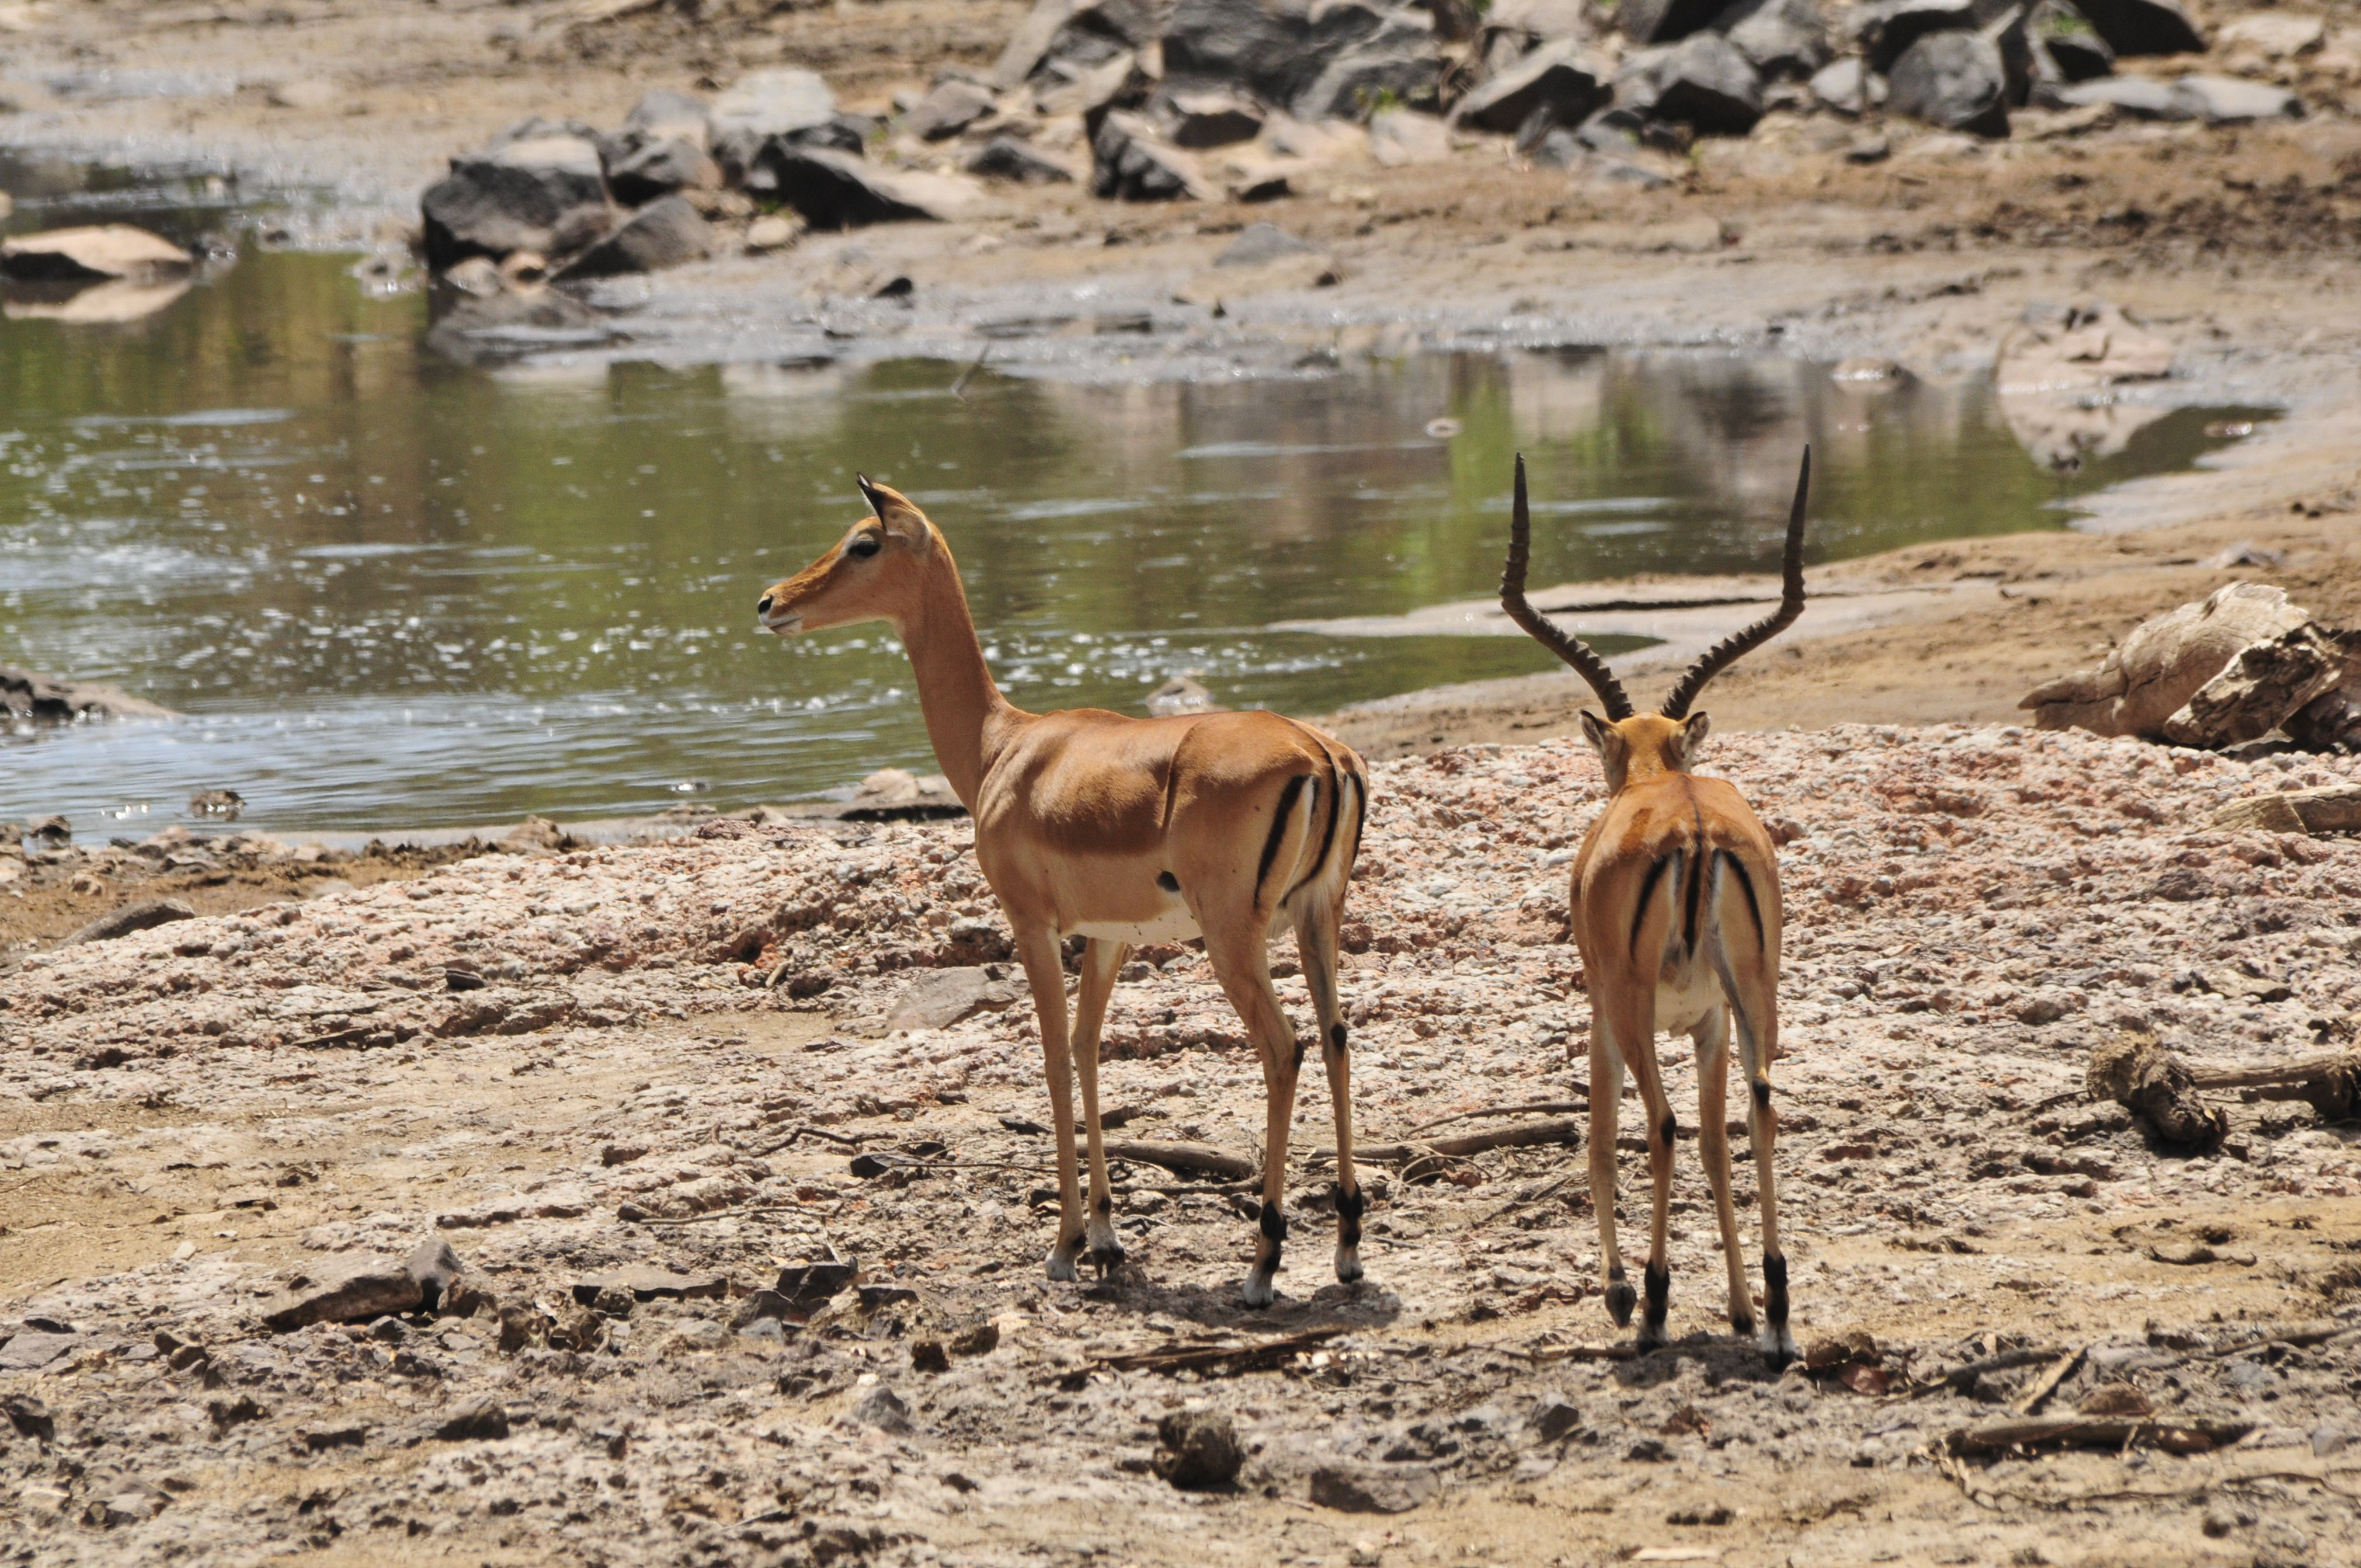 Grants Gazelle at Serengeti National Park